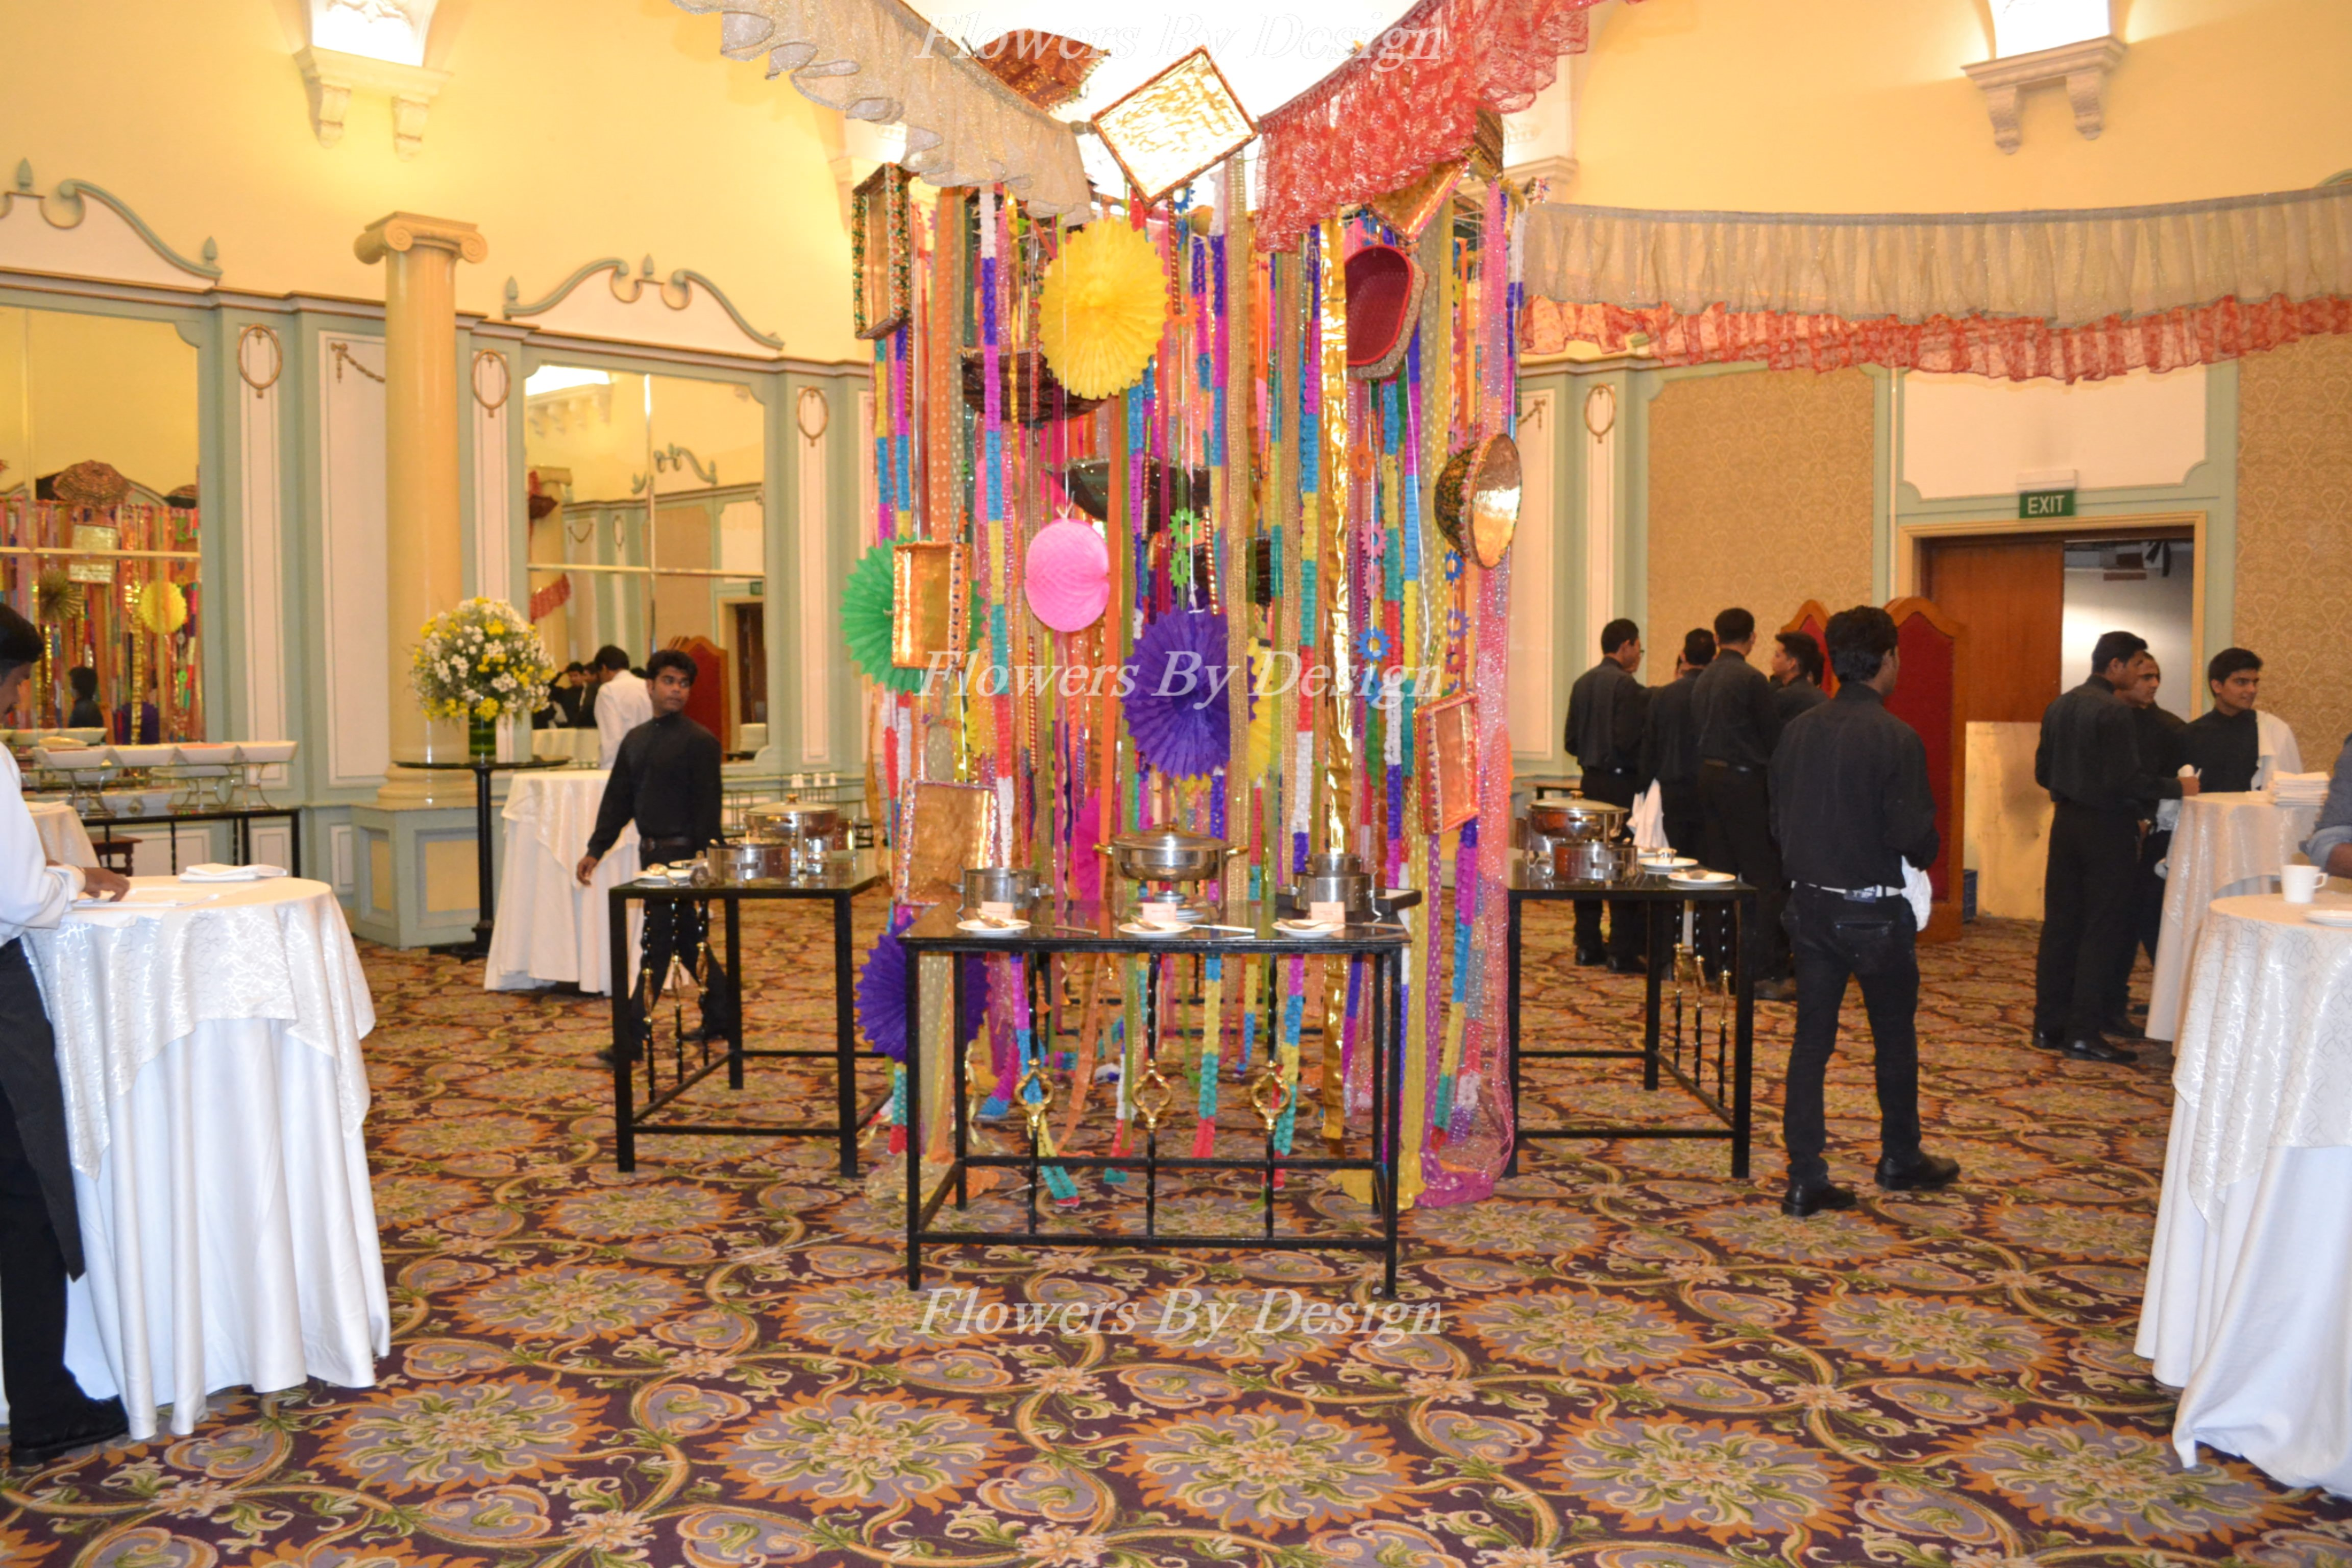 Dining hall Wedding Backdrop Decoration